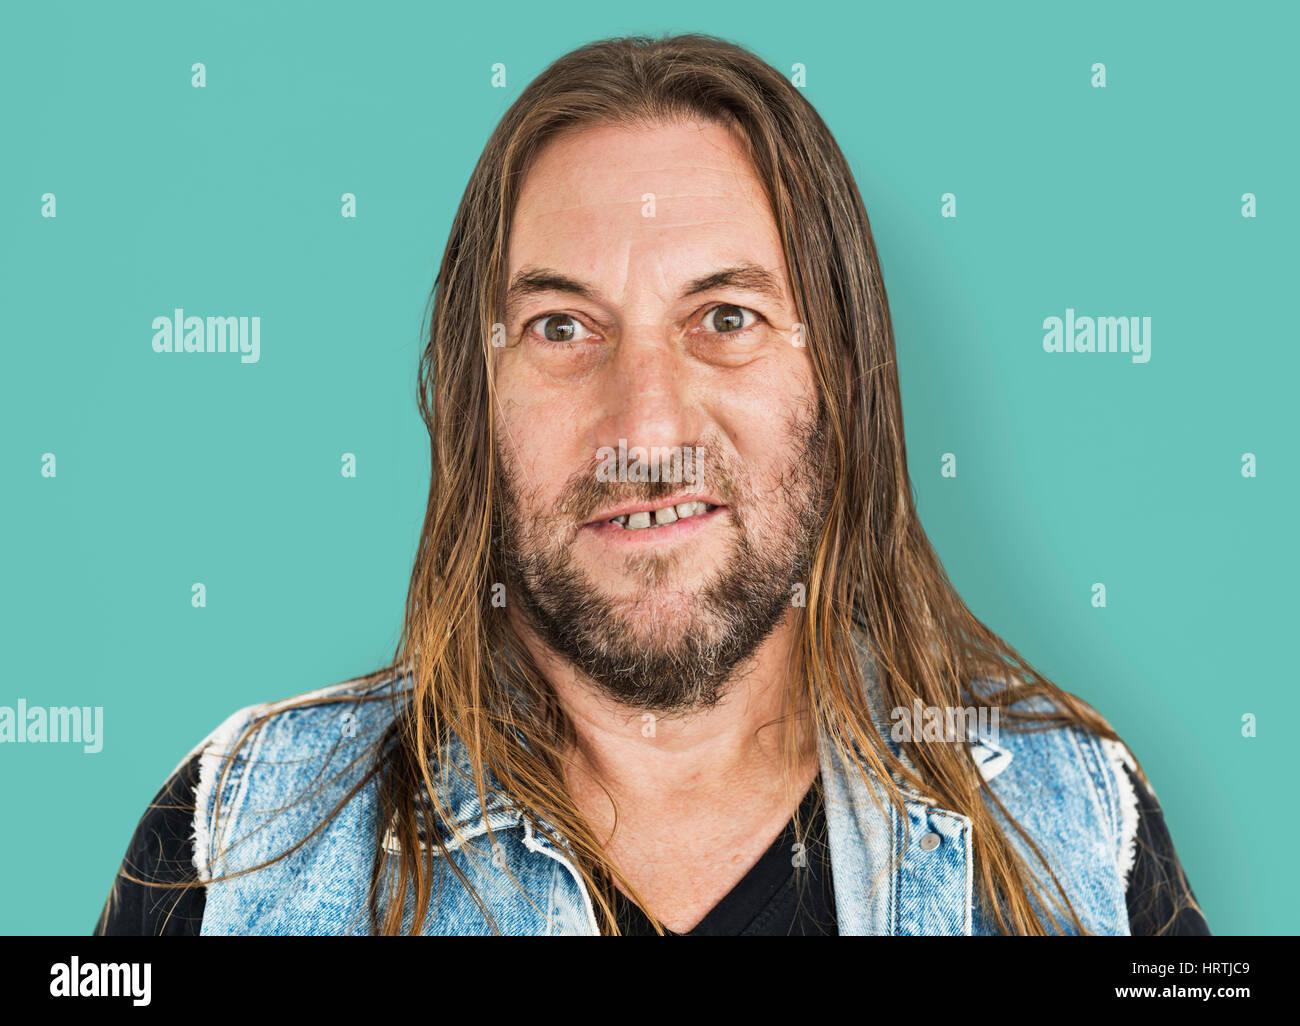 Mann Lange Haare Frisur Lächelnd Hohn Porträt Konzept